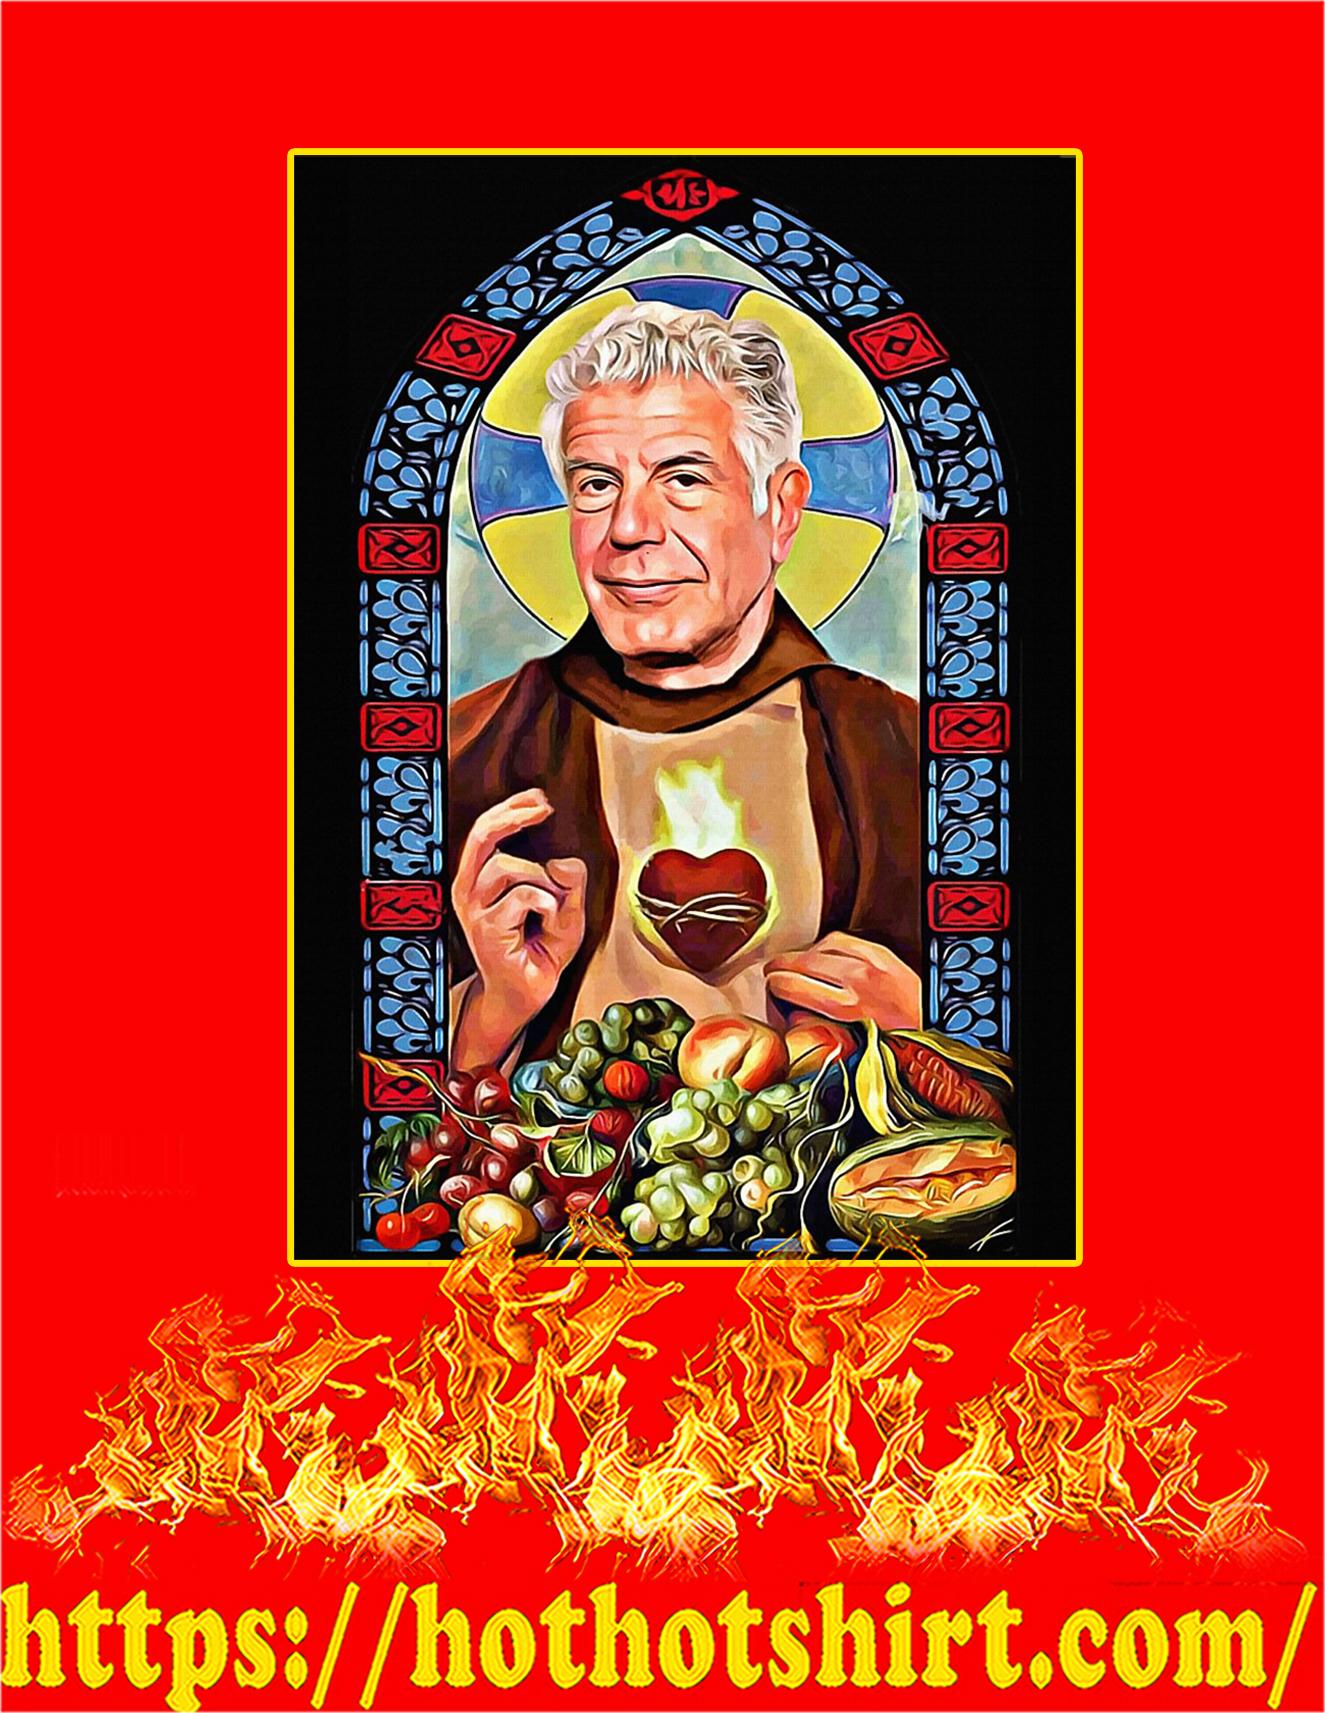 Patron saint of food and life prayer poster - A3